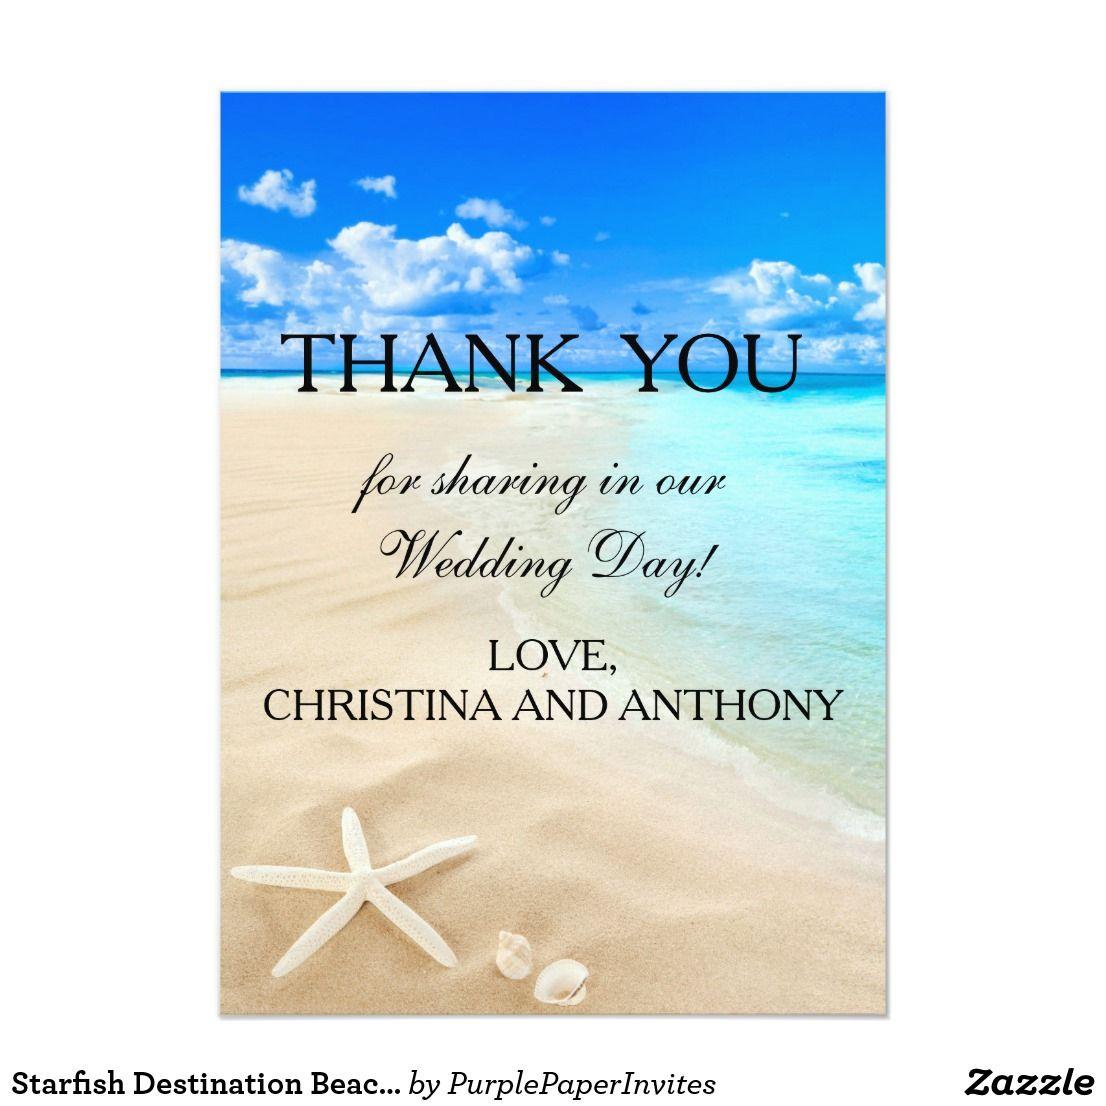 Starfish Destination Beach Wedding Thank You Note